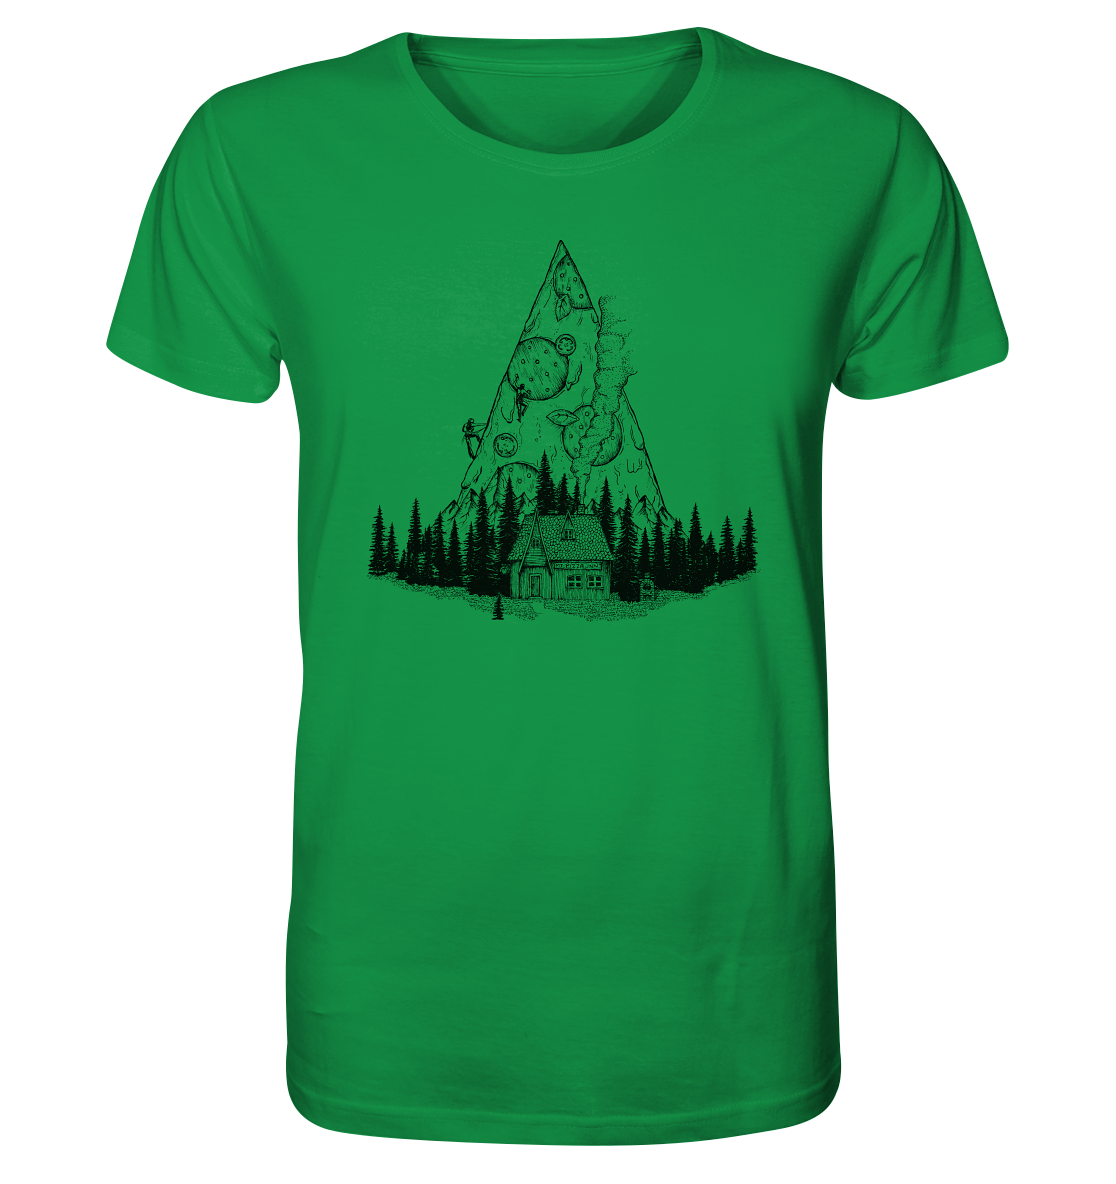 front-organic-shirt-149348-1116x-11.png